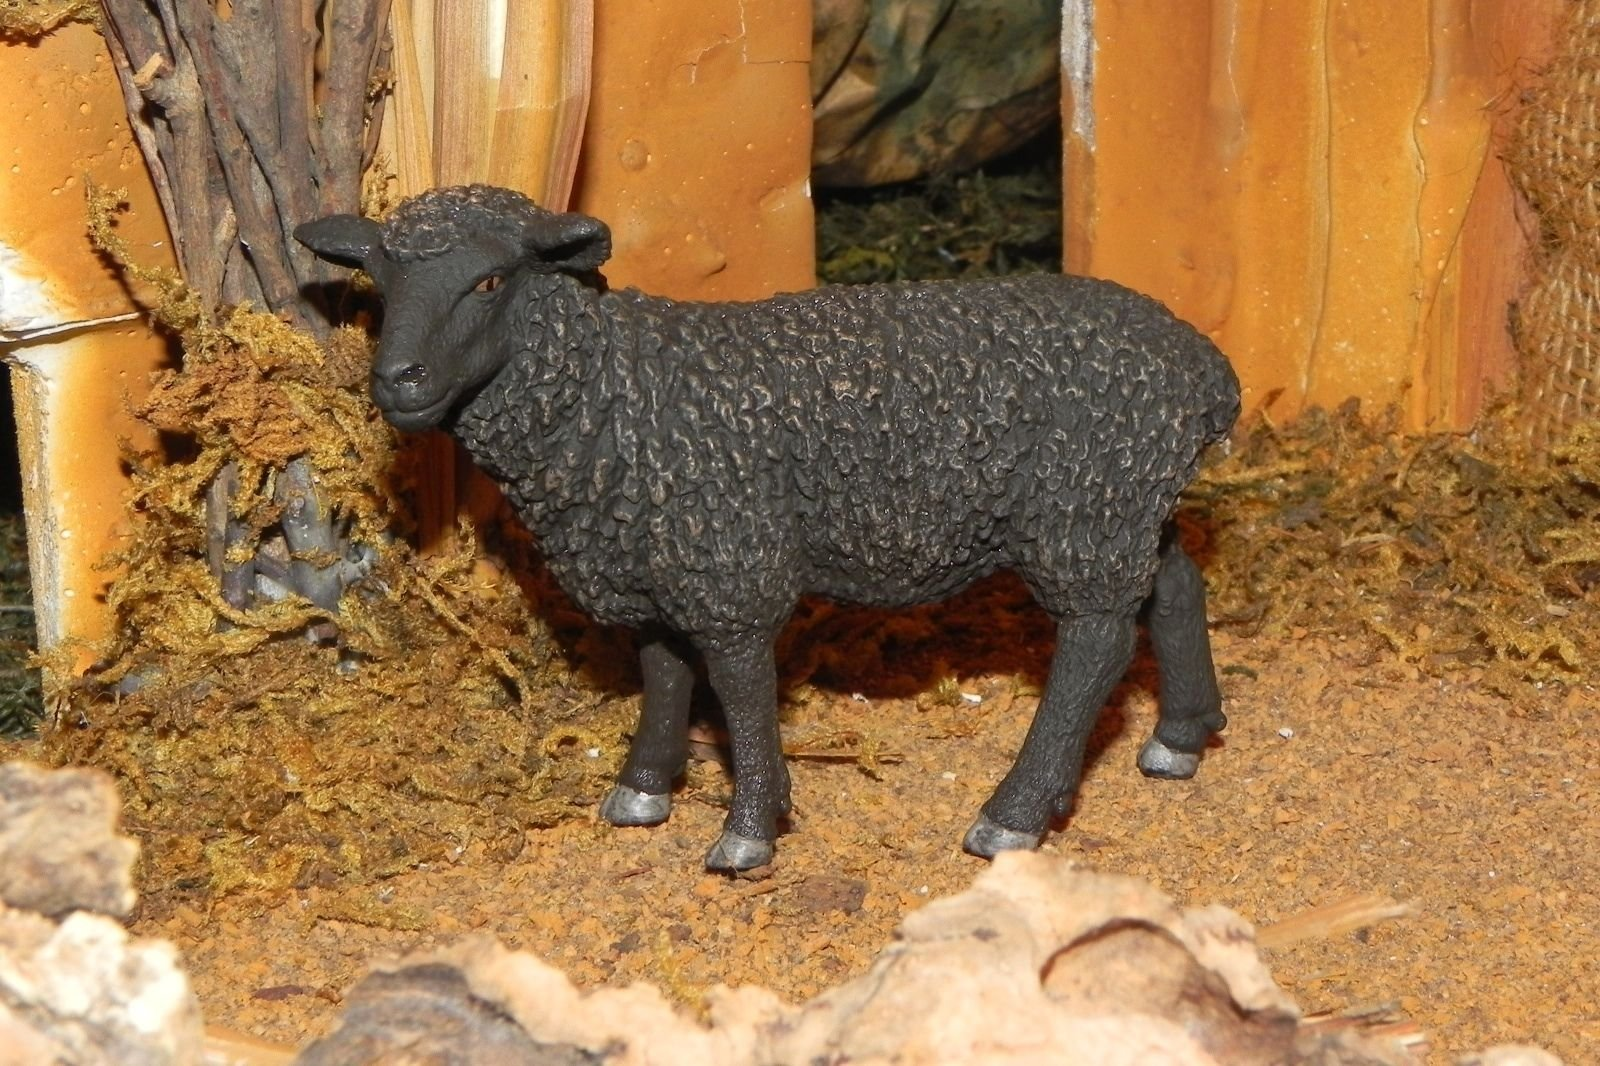 Collectible Figurine Black Sheep Animal 5'' Nativity Scene Figure - USA_Mall